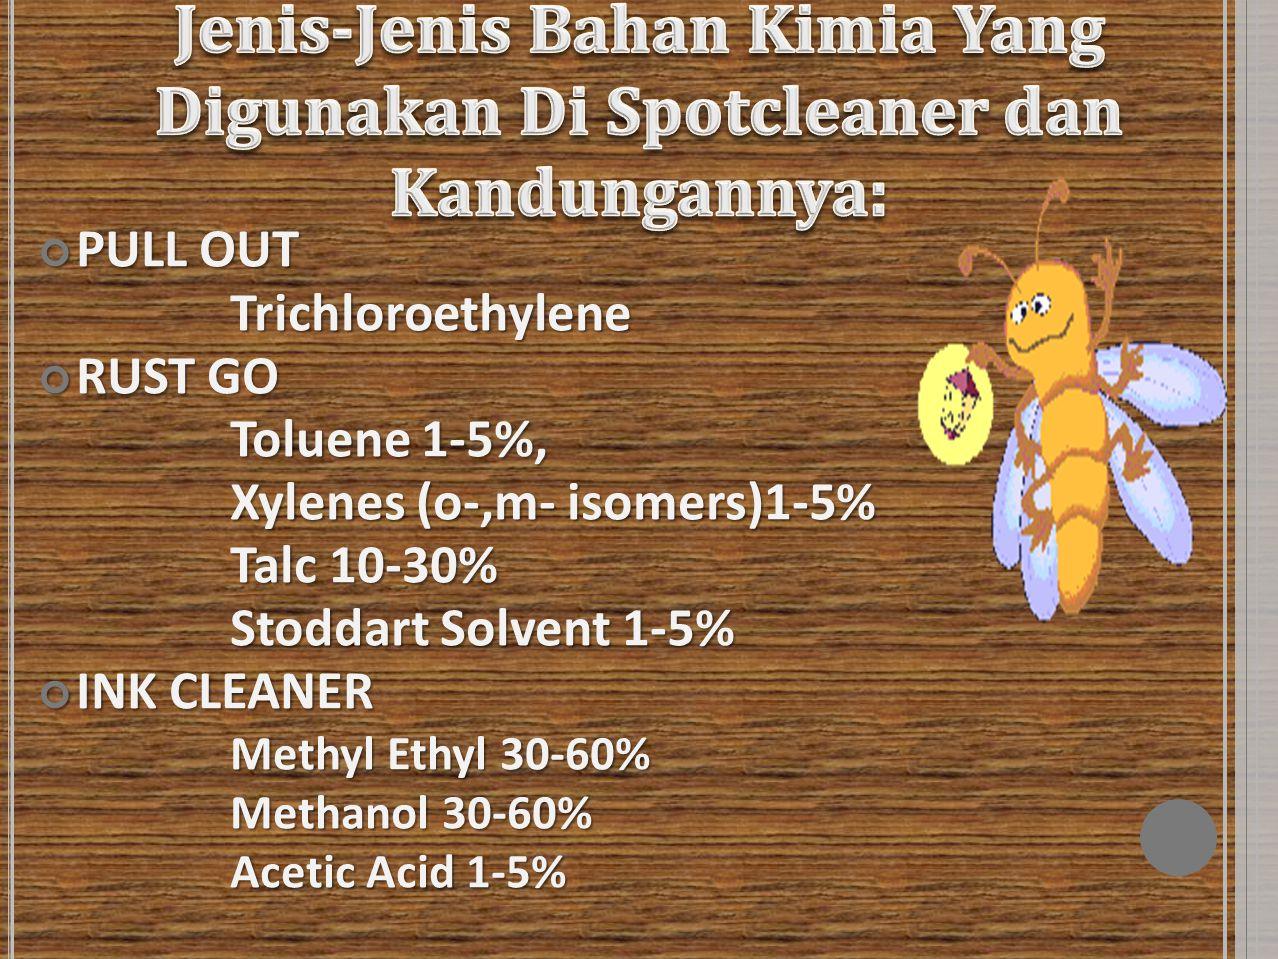 Jenis-Jenis Bahan Kimia Yang Digunakan Di Spotcleaner dan Kandungannya: